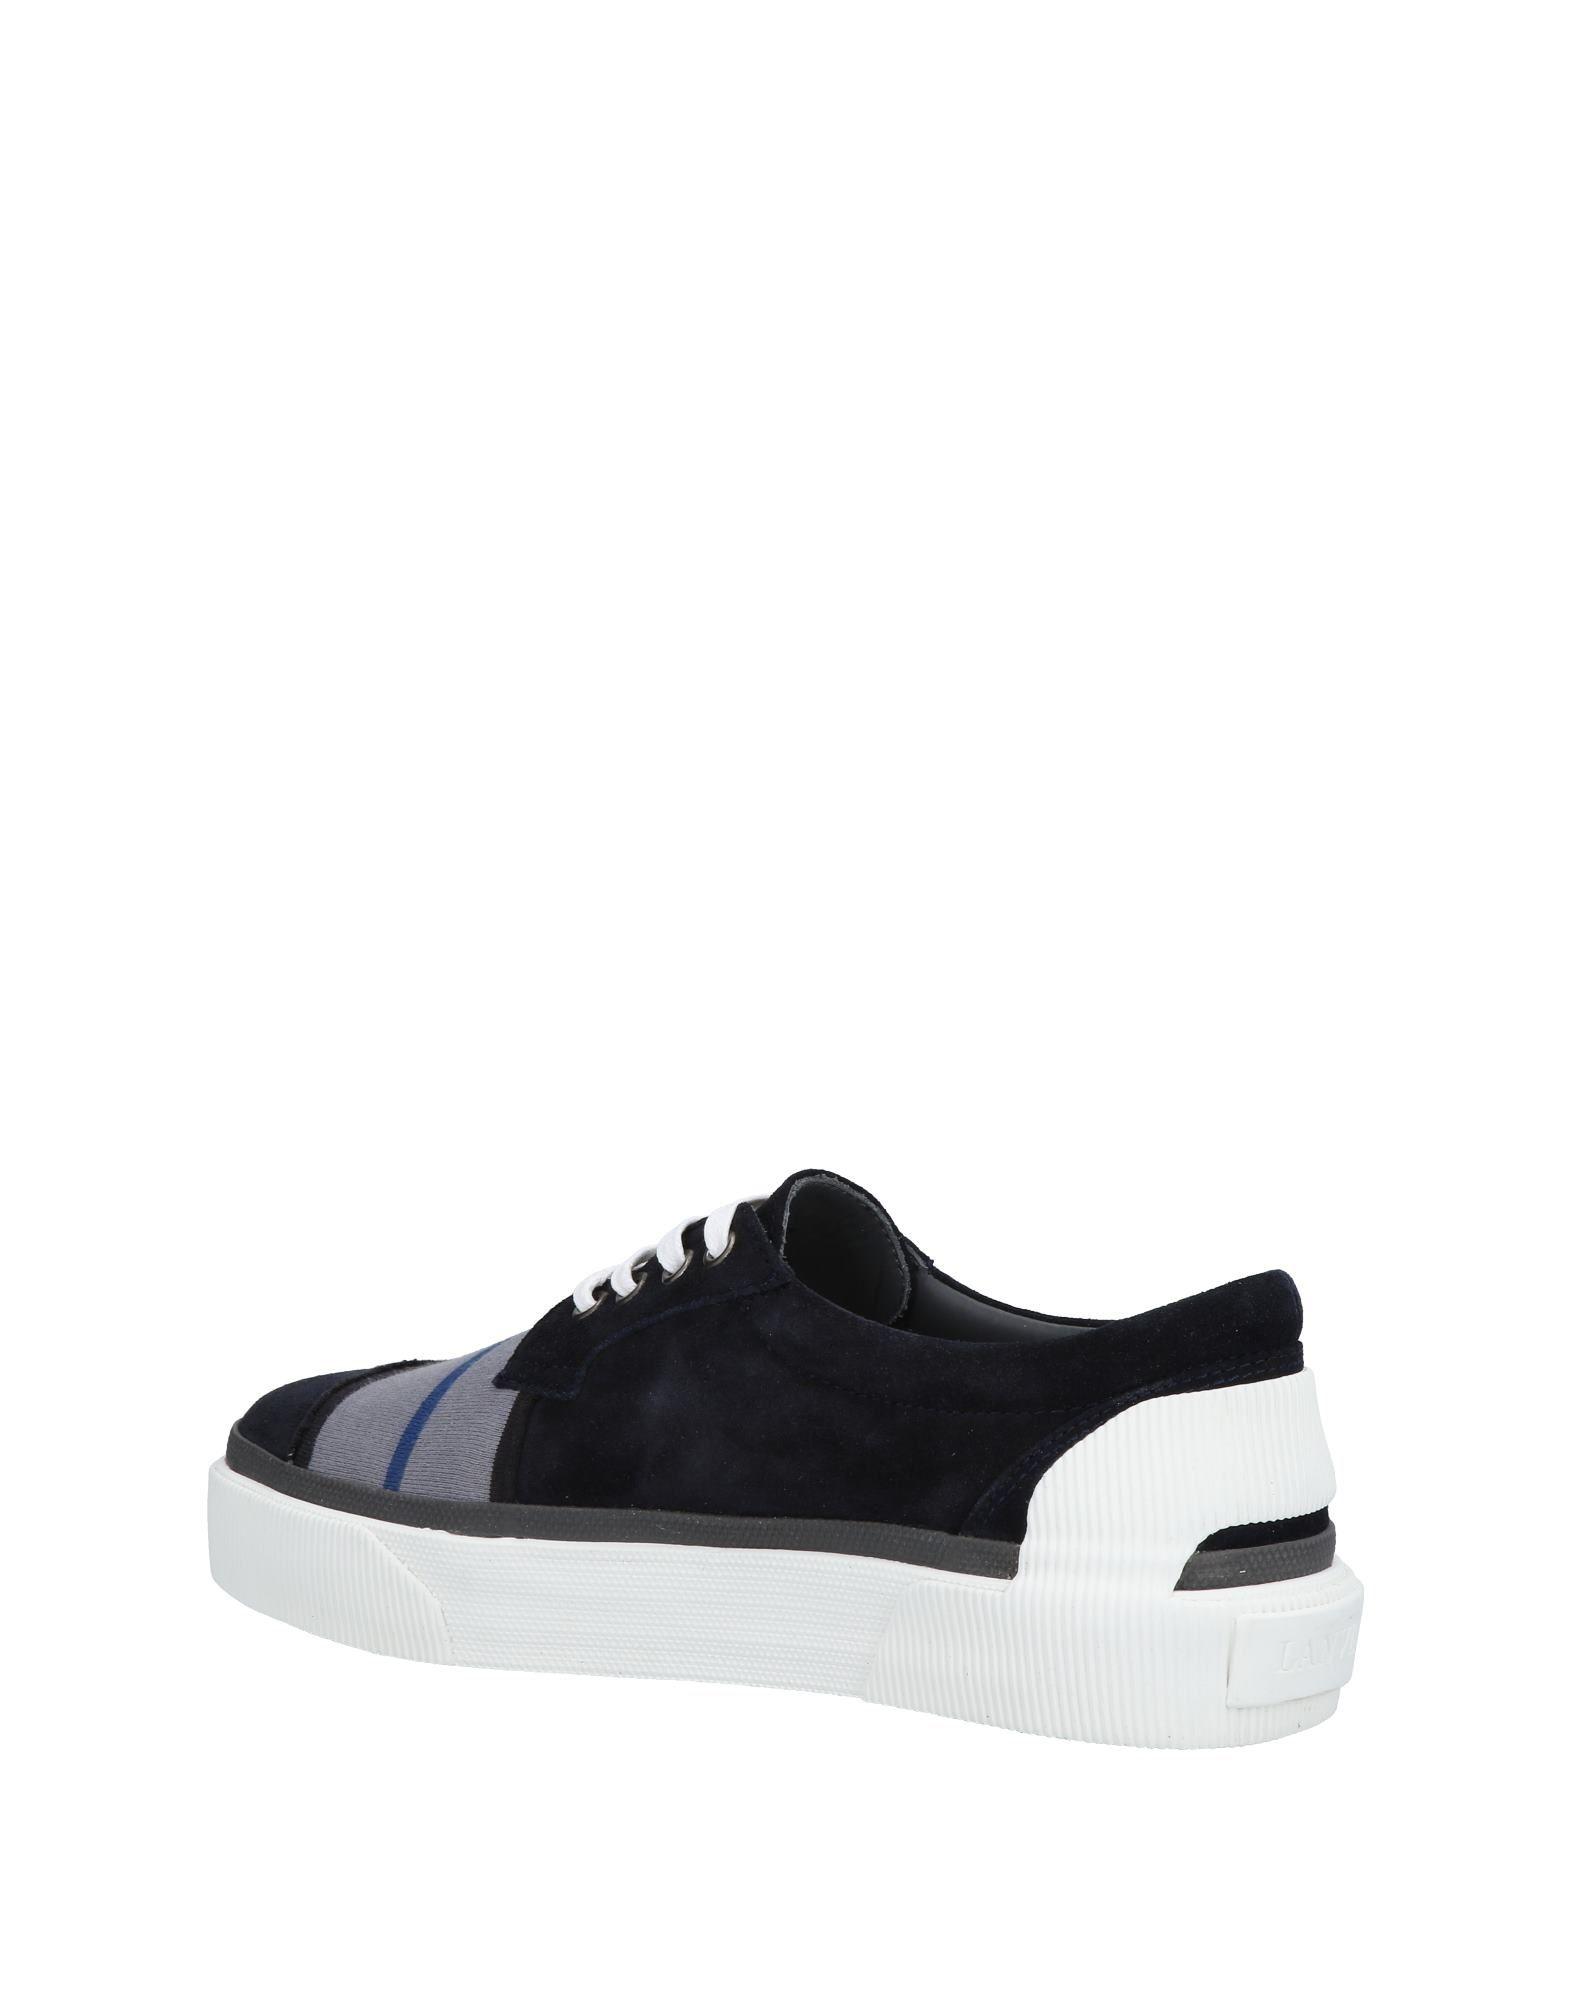 Lanvin Sneakers Herren  Schuhe 11479688DC Gute Qualität beliebte Schuhe  bb74cc